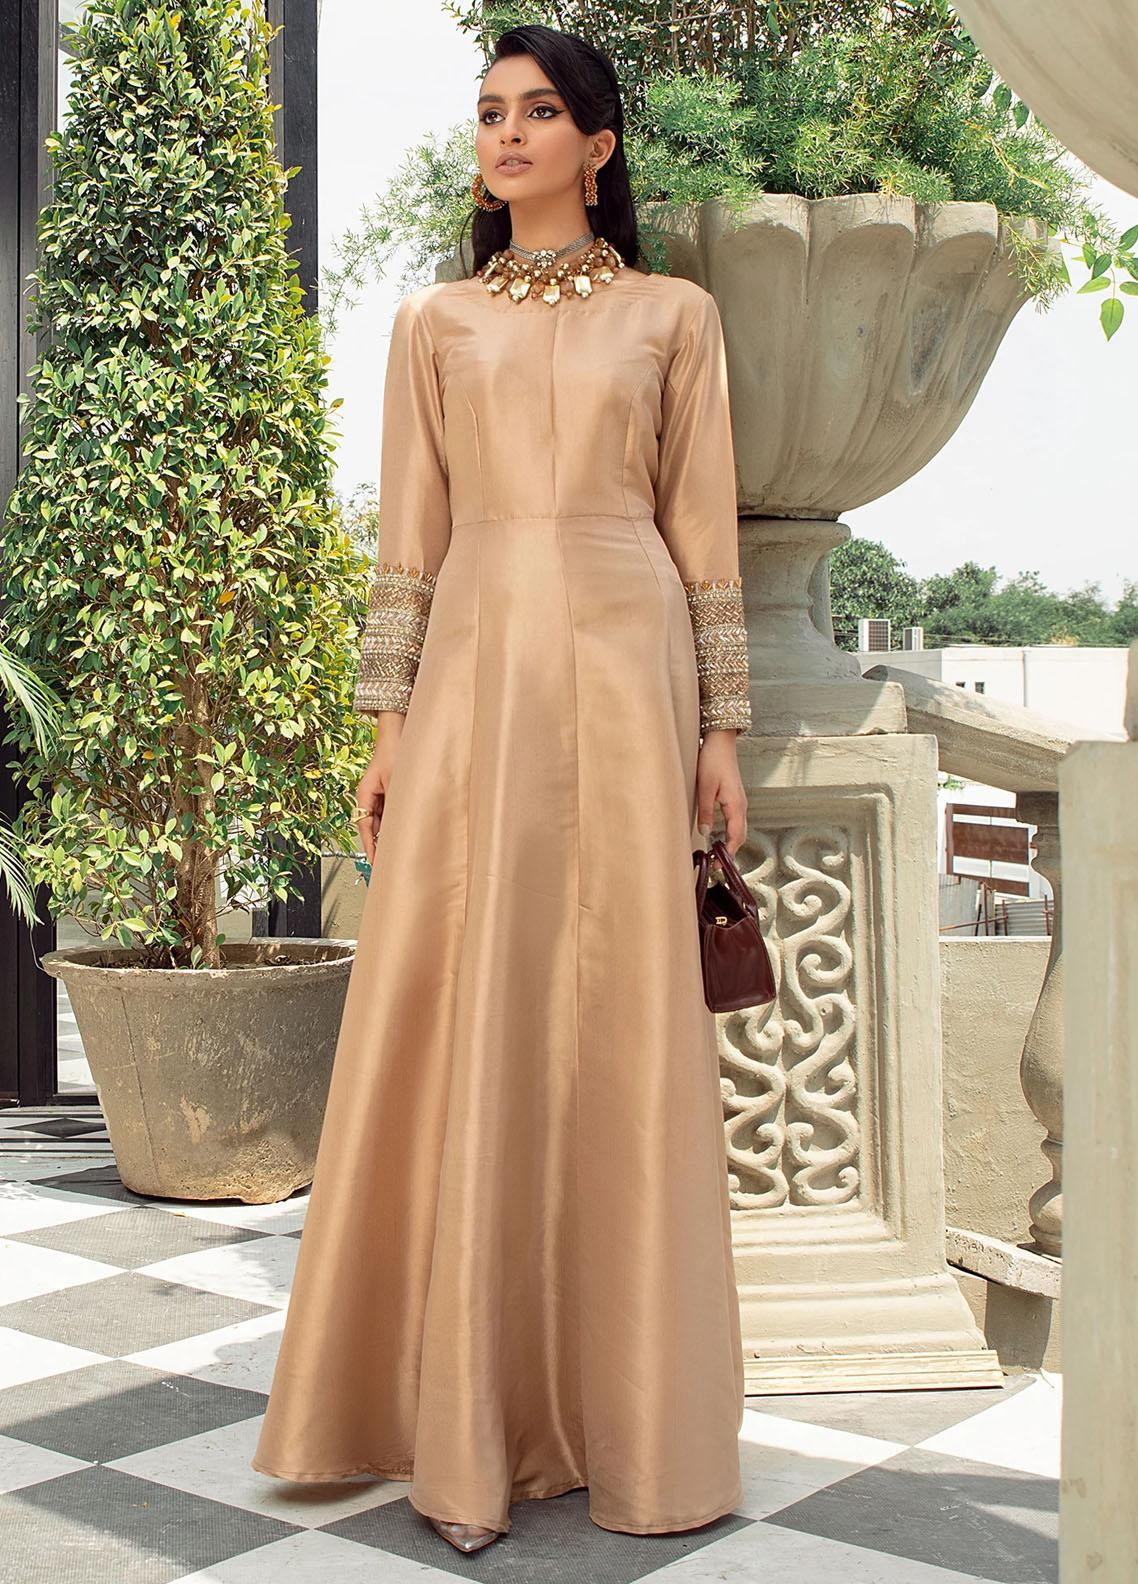 Vanya Party Wear Raw Silk Stitched Gown FJ-06